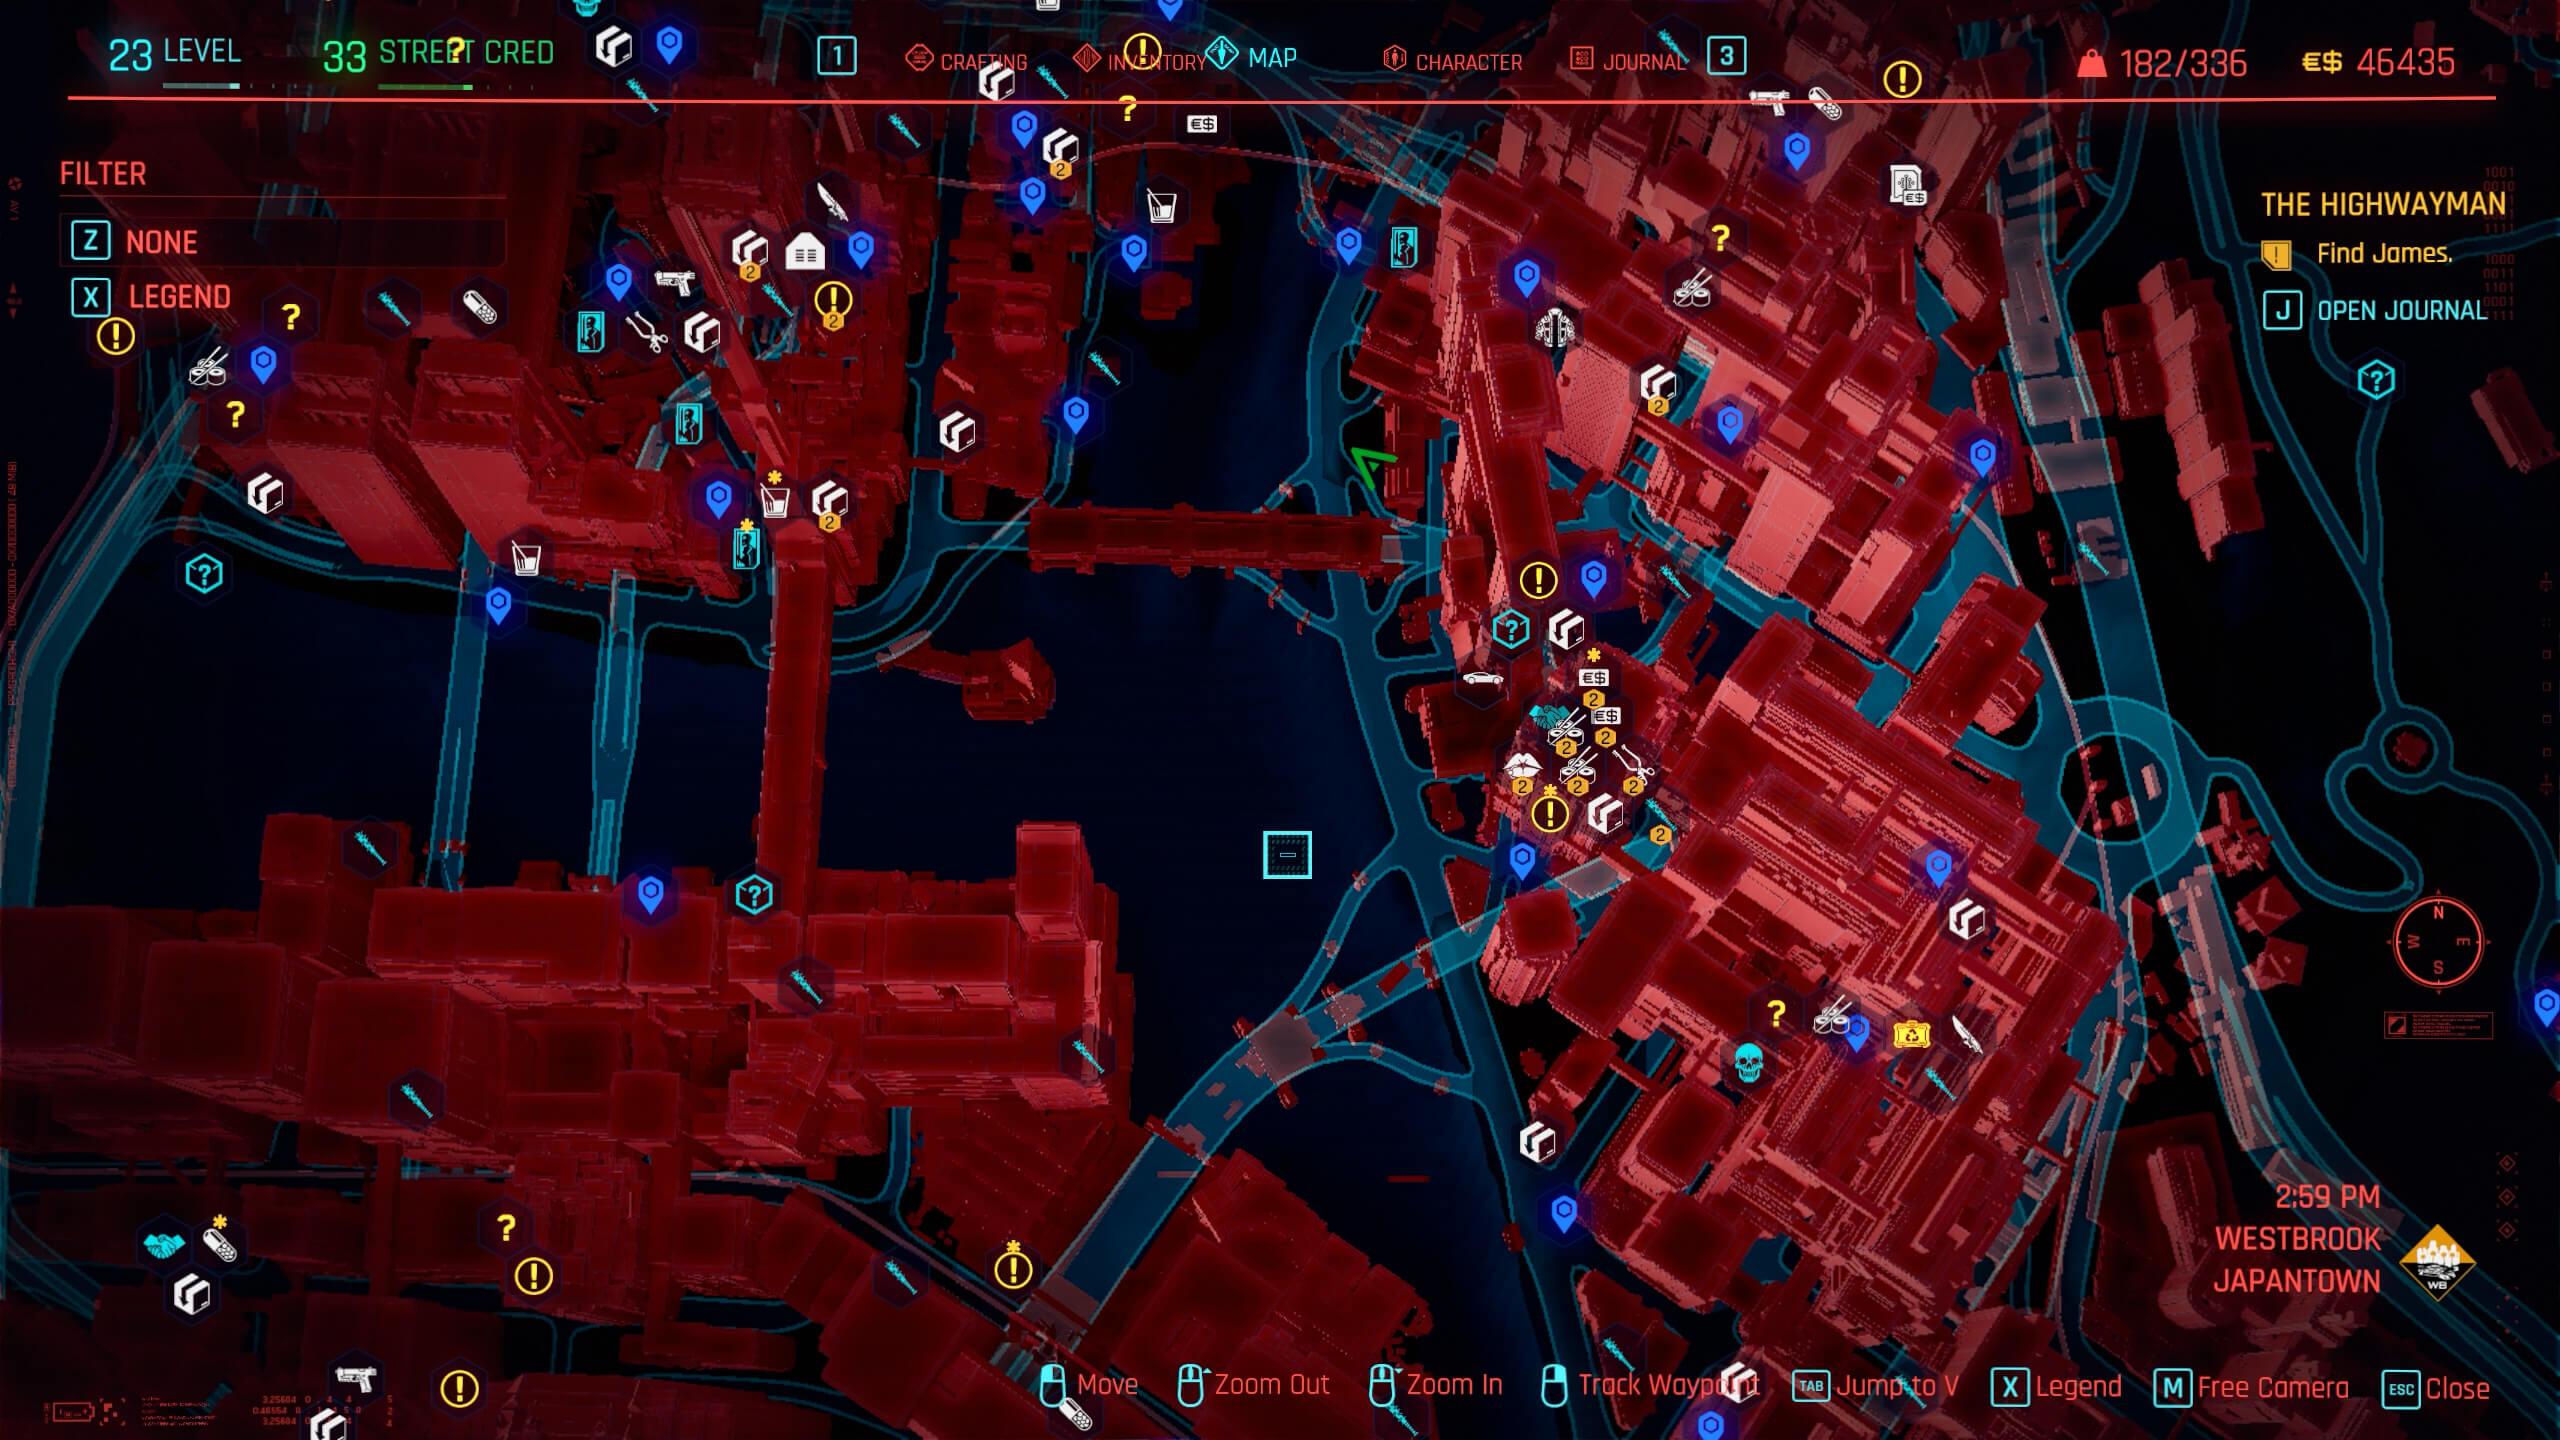 James location - The Highwayman - Cyberpunk 2077